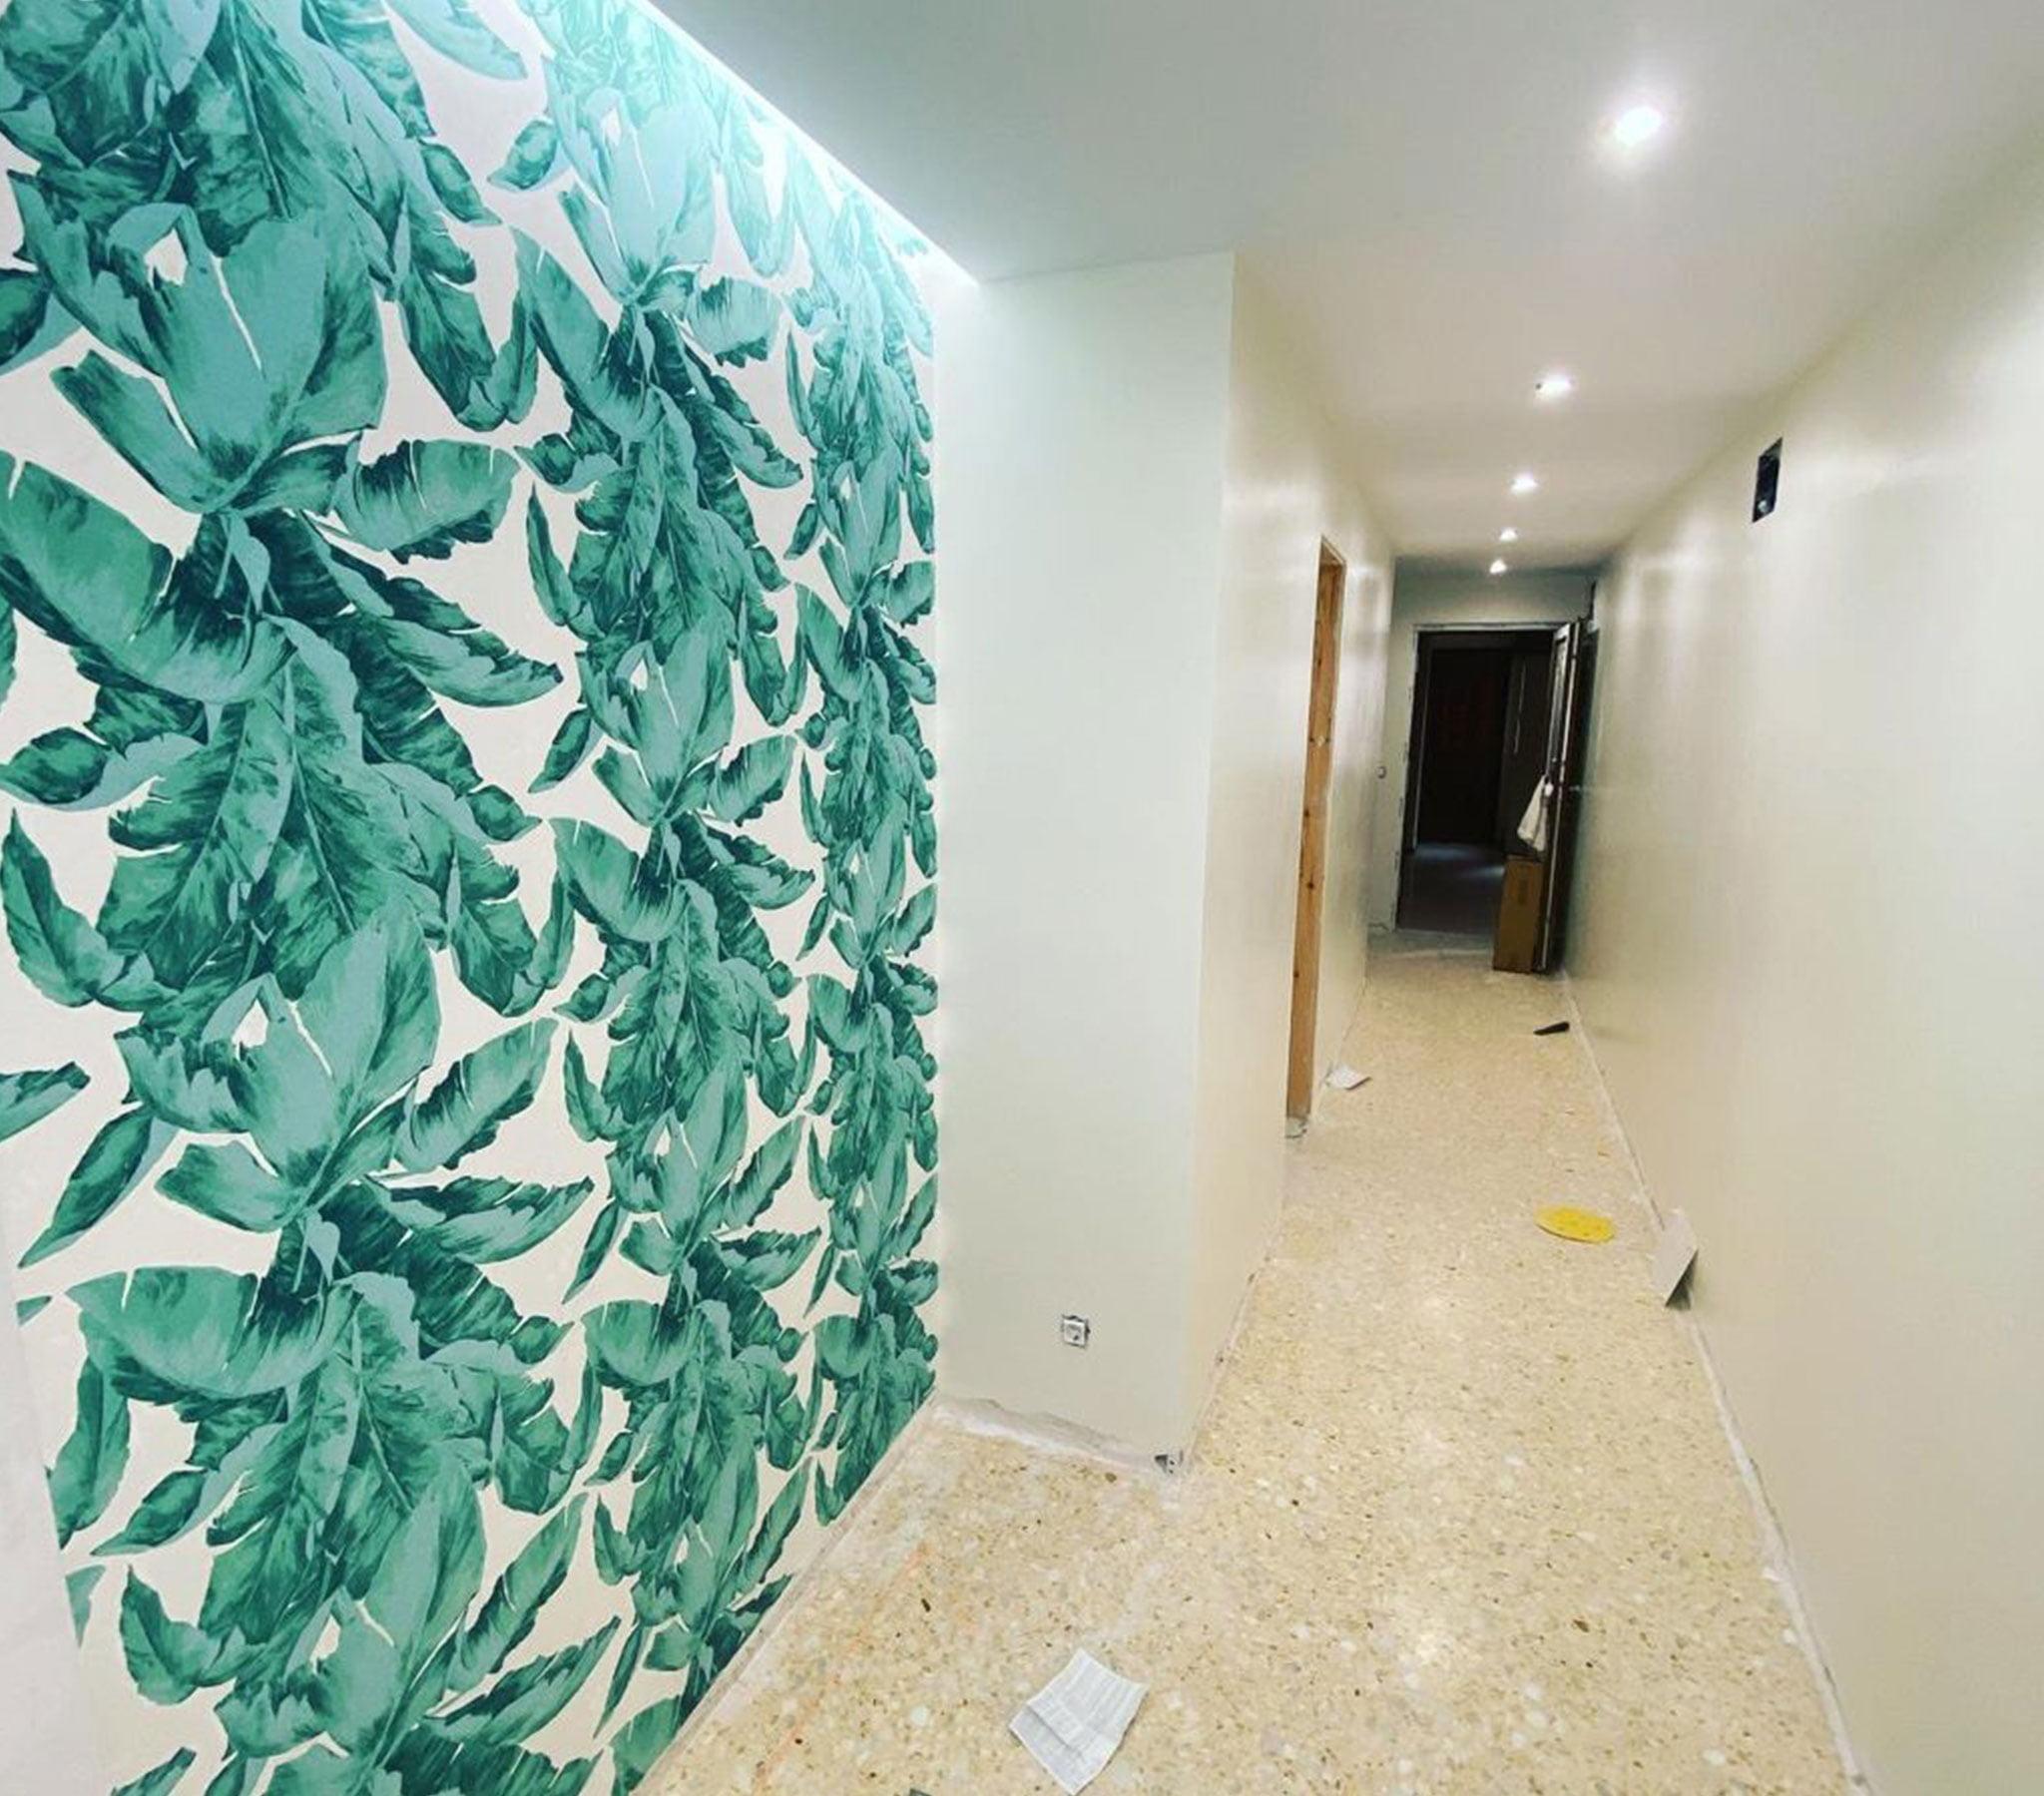 Después de la pintura del pasillo de una vivienda – Pinturas Juanvi Ortolà